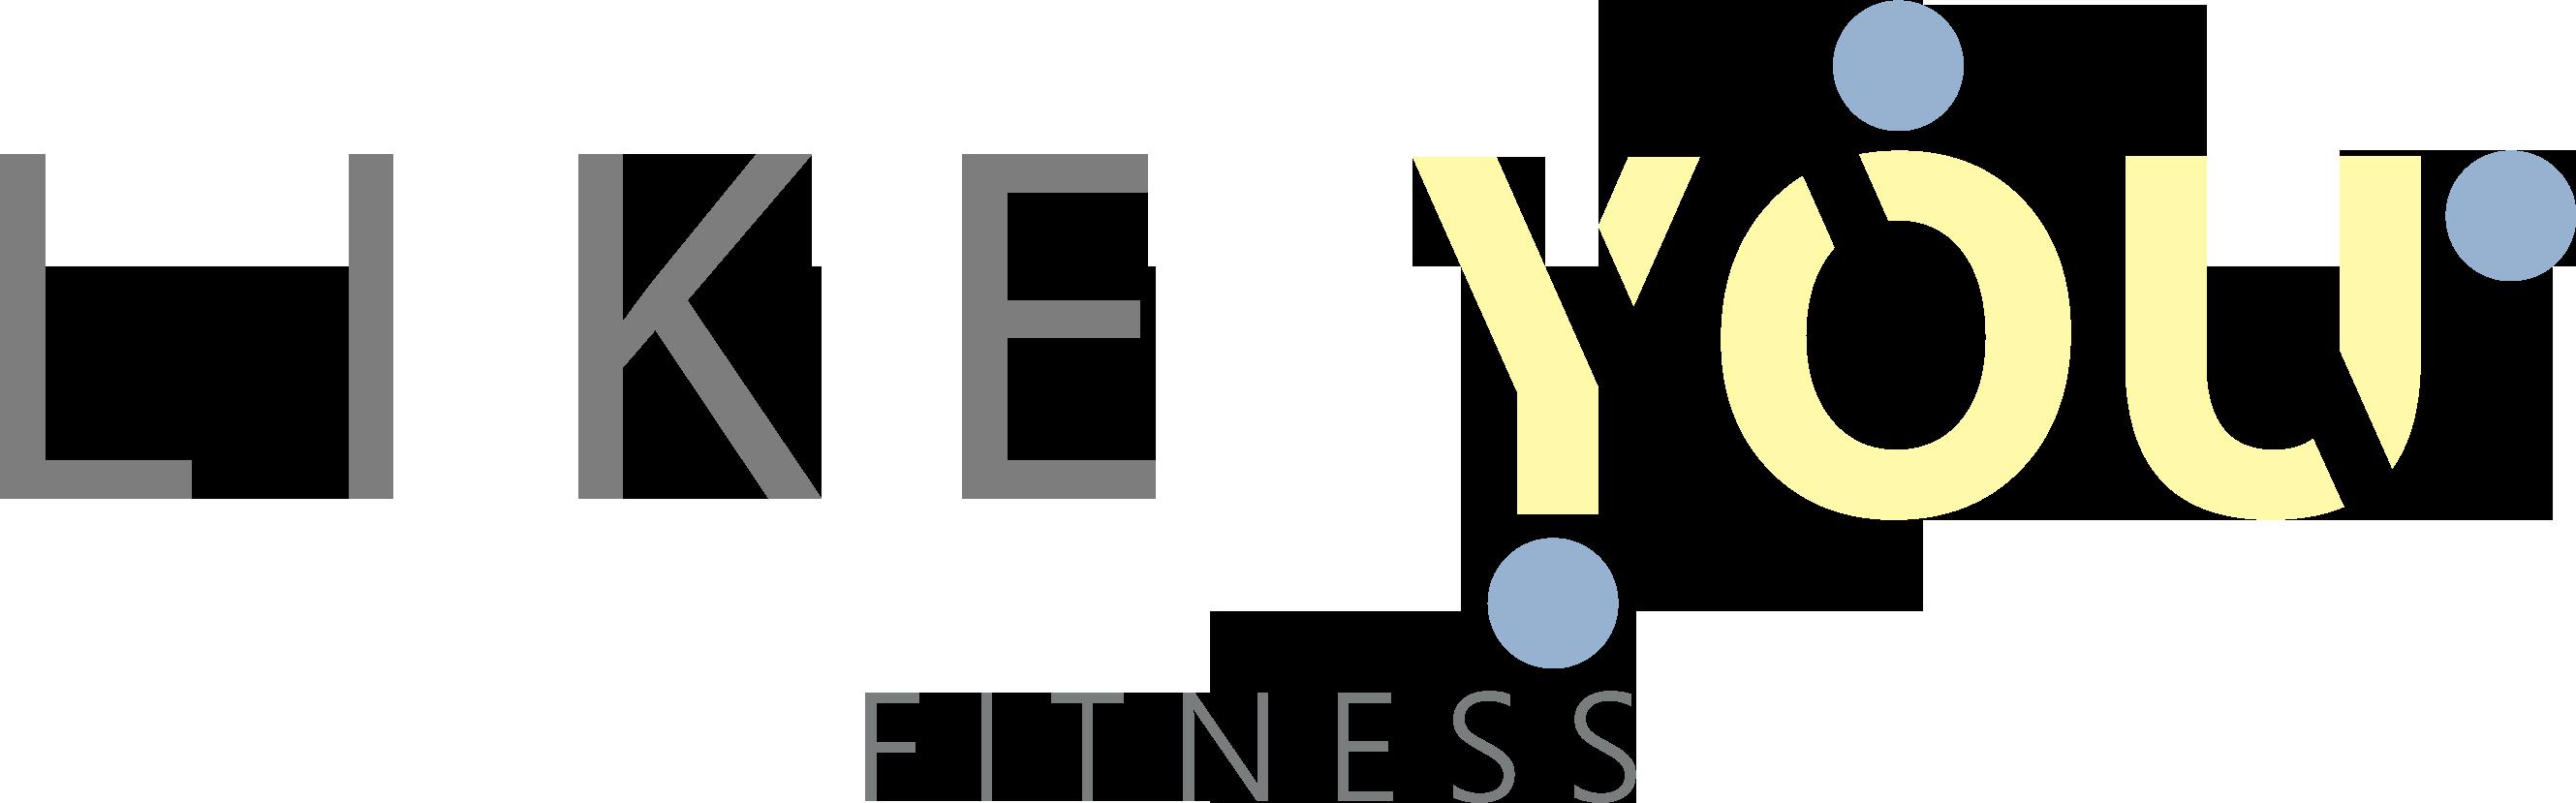 Blog Like You Fitness